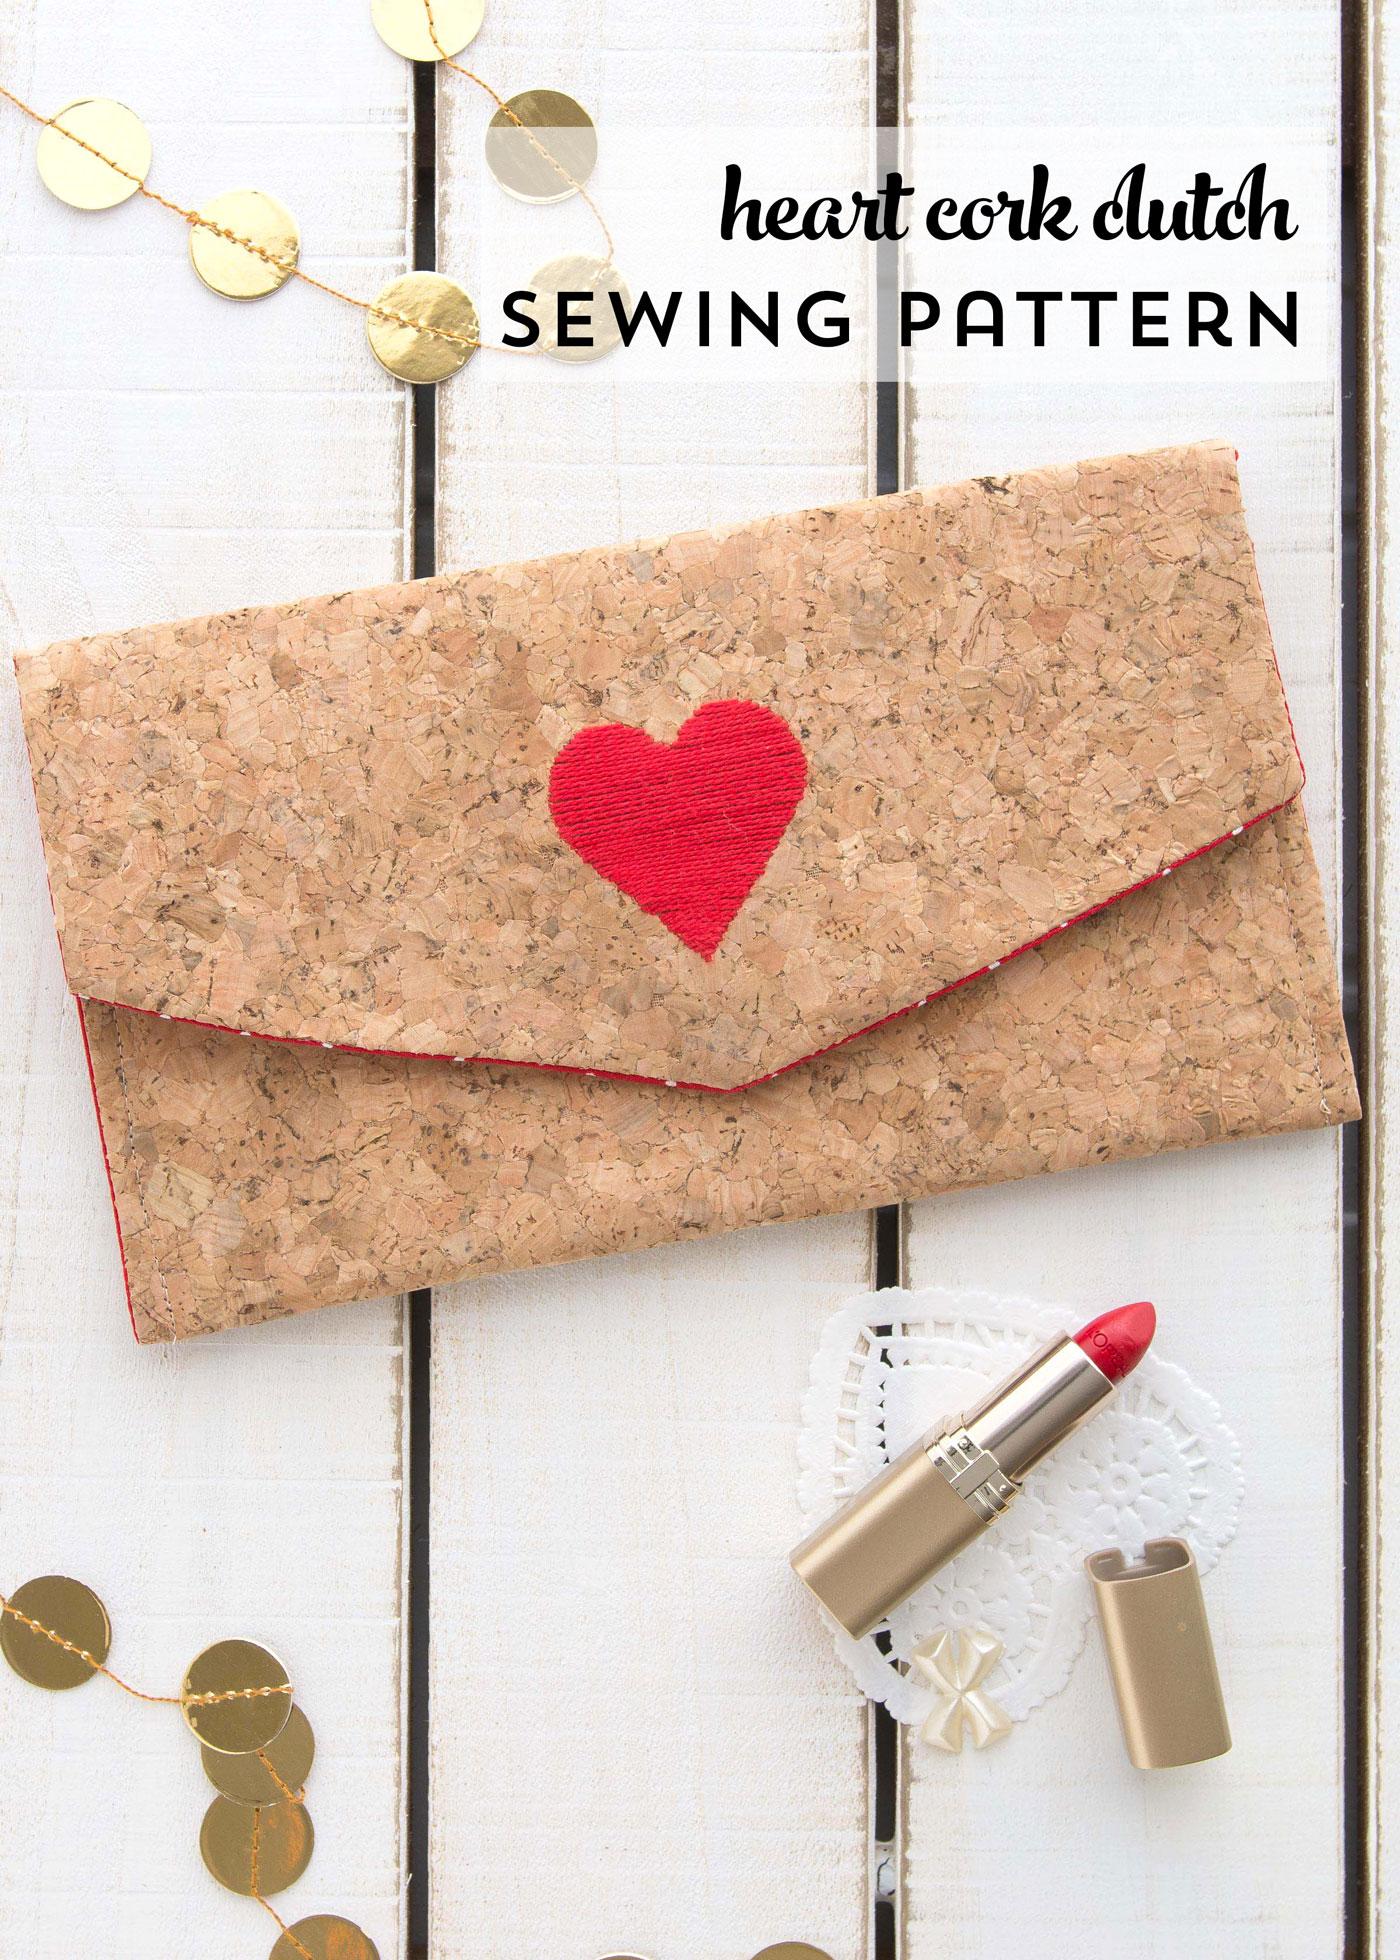 DIY Cork Clutch Sewing Pattern by Melissa Mortenson for JoAnn Stores